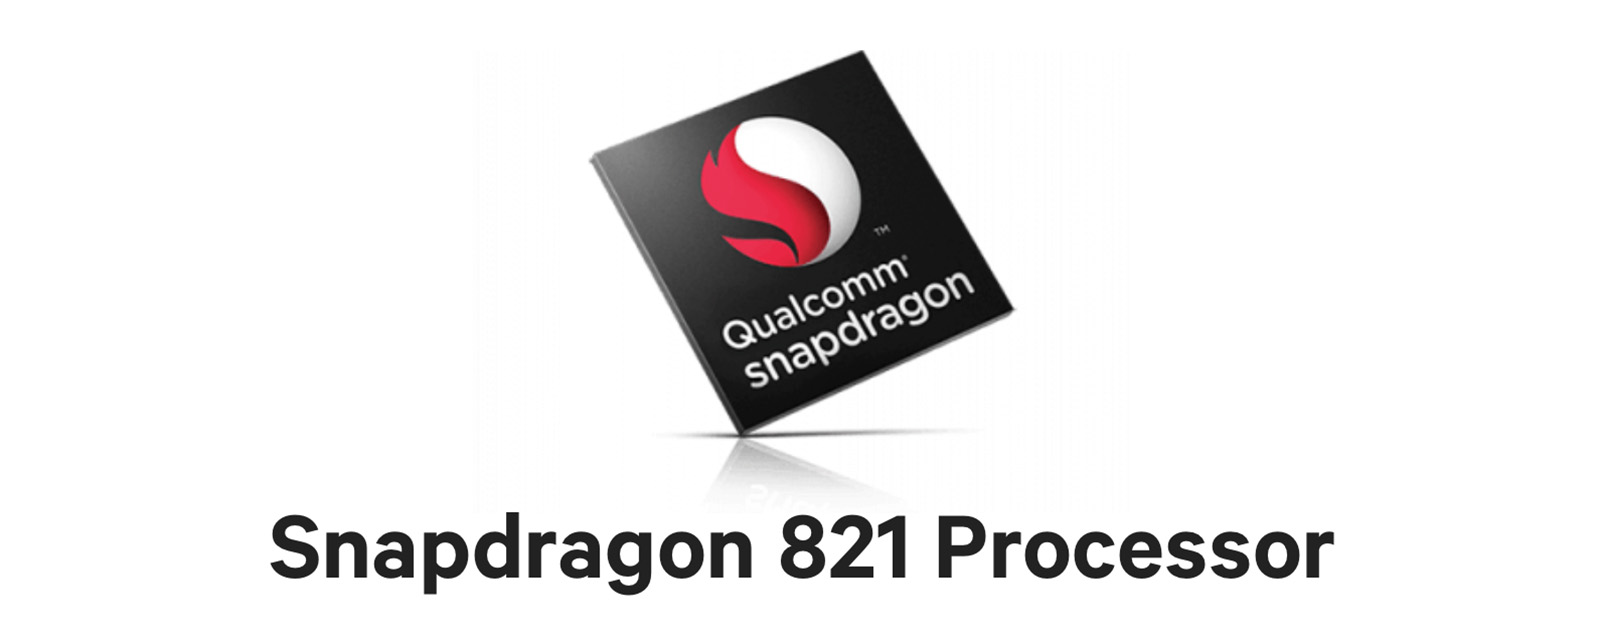 Google Pixel、Pixel XL Snapdragon 821